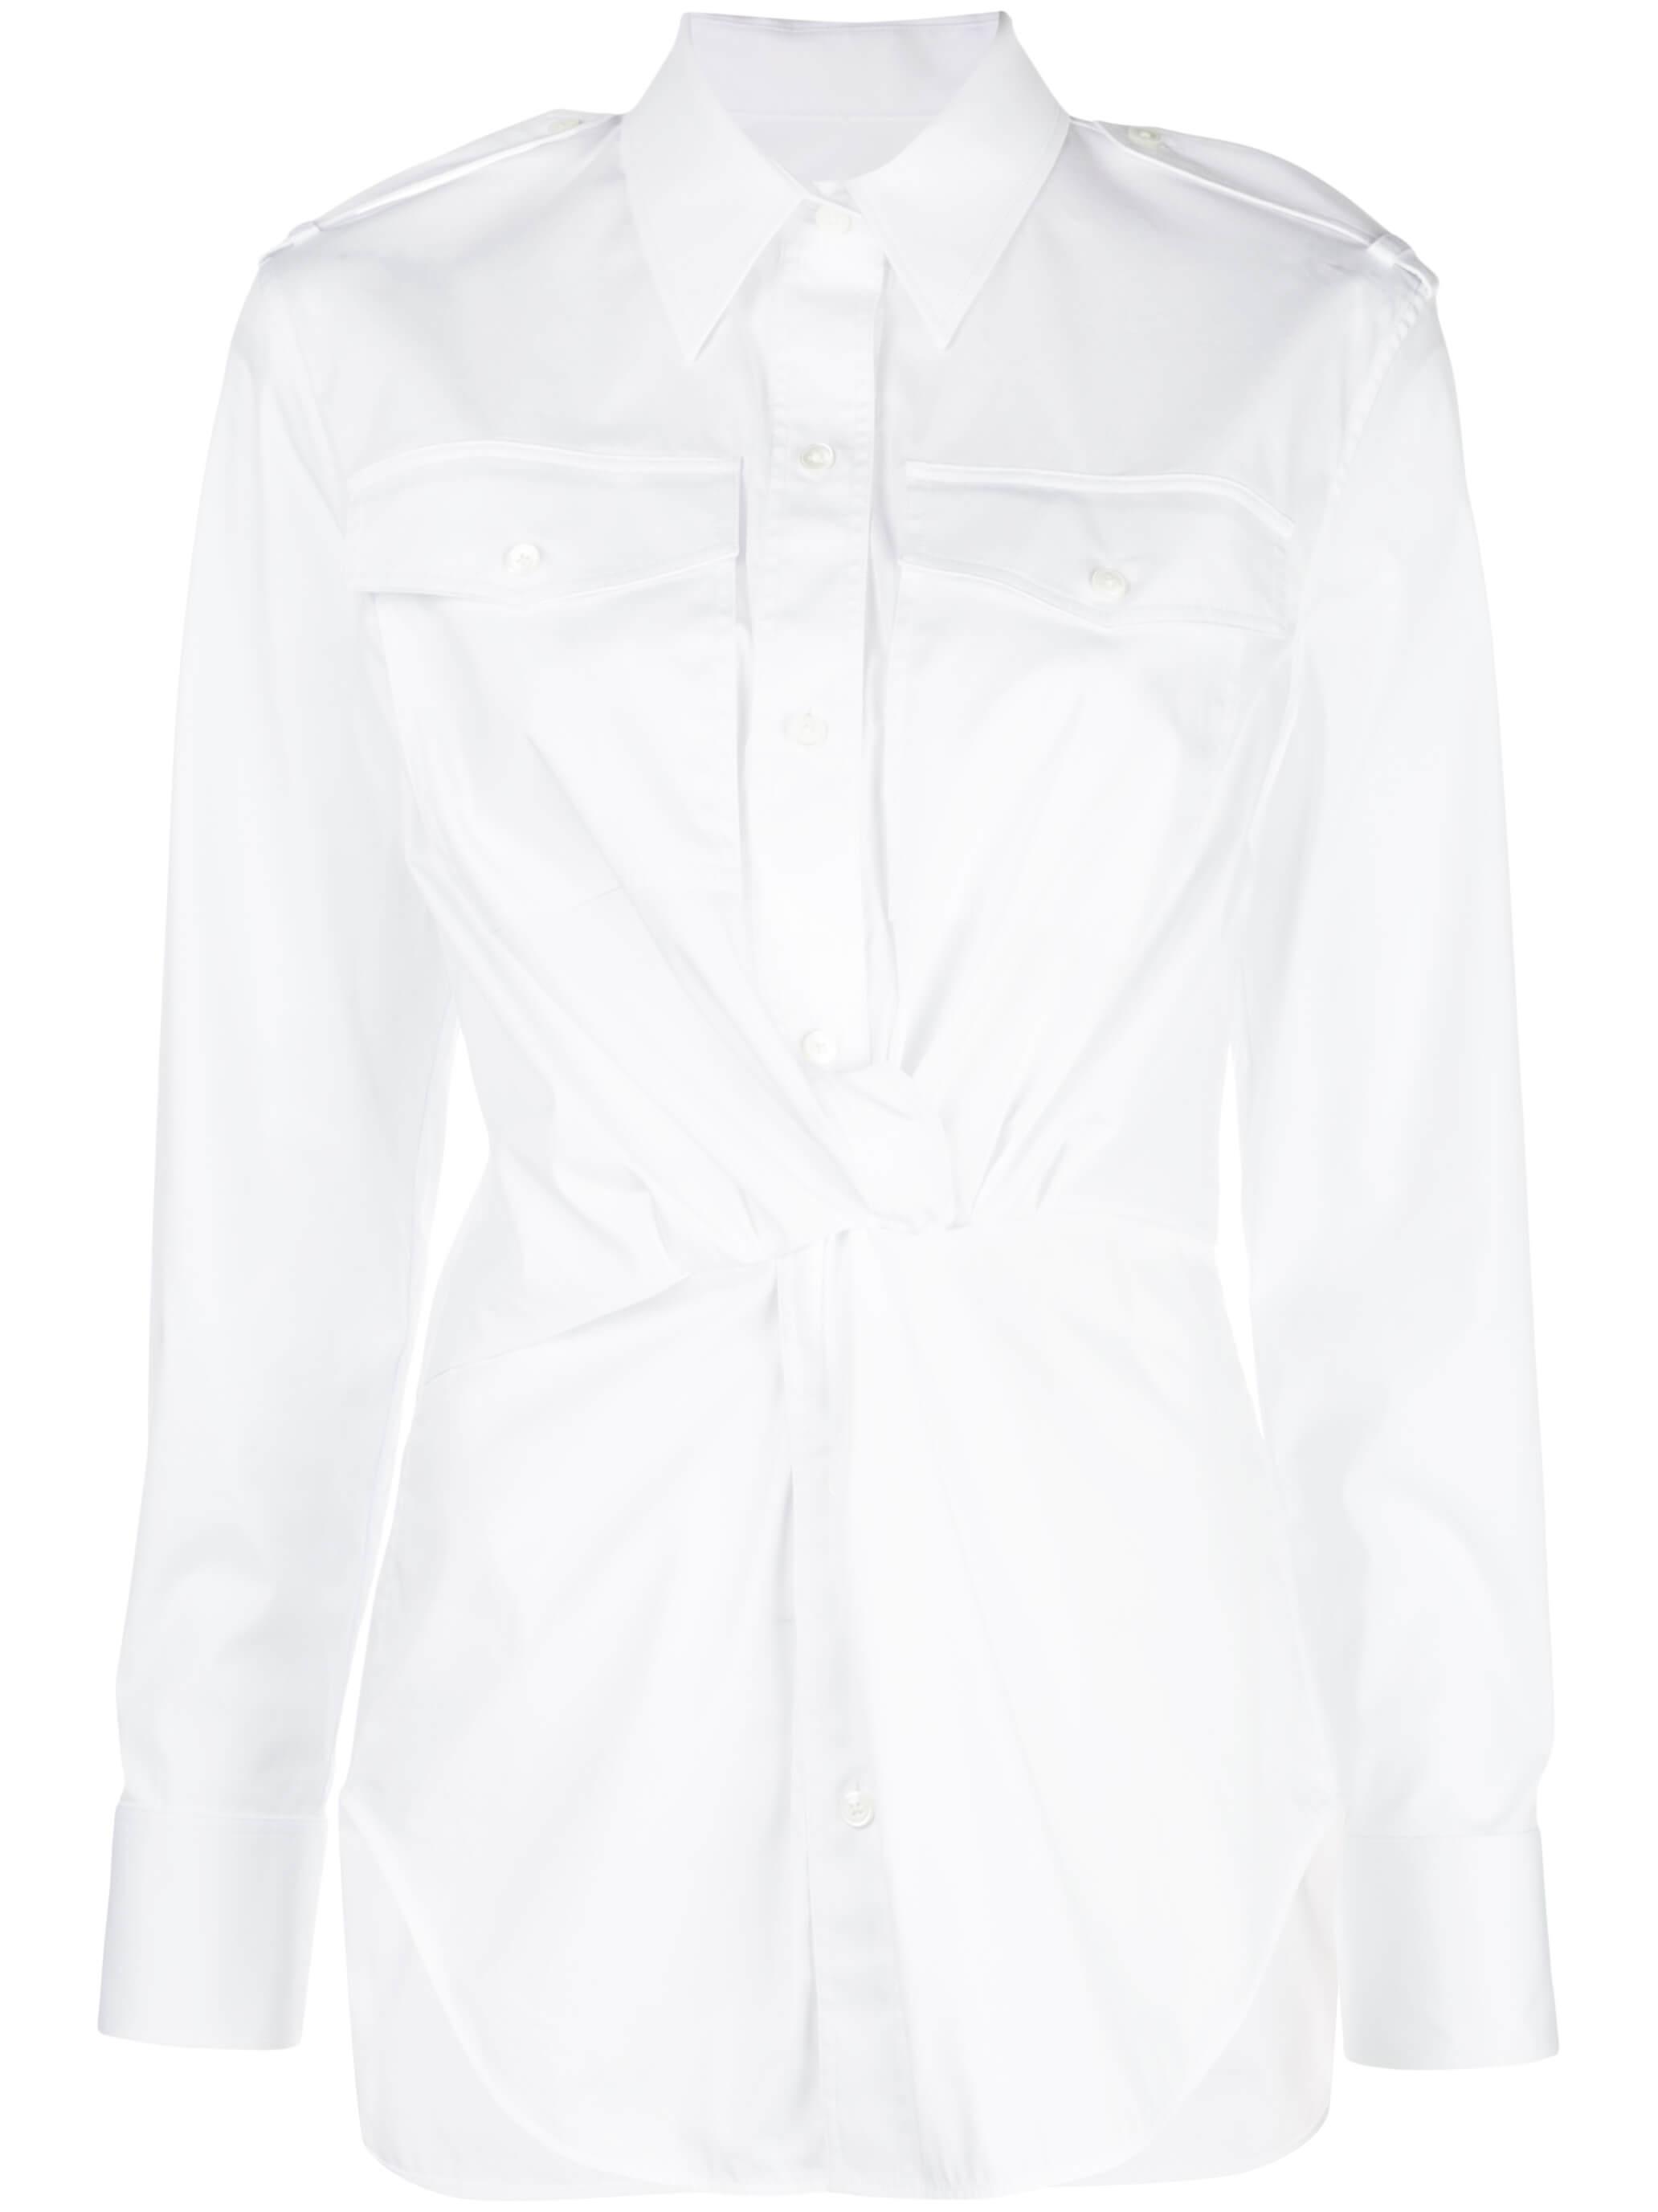 Compact Cotton Poplin Knot Shirt